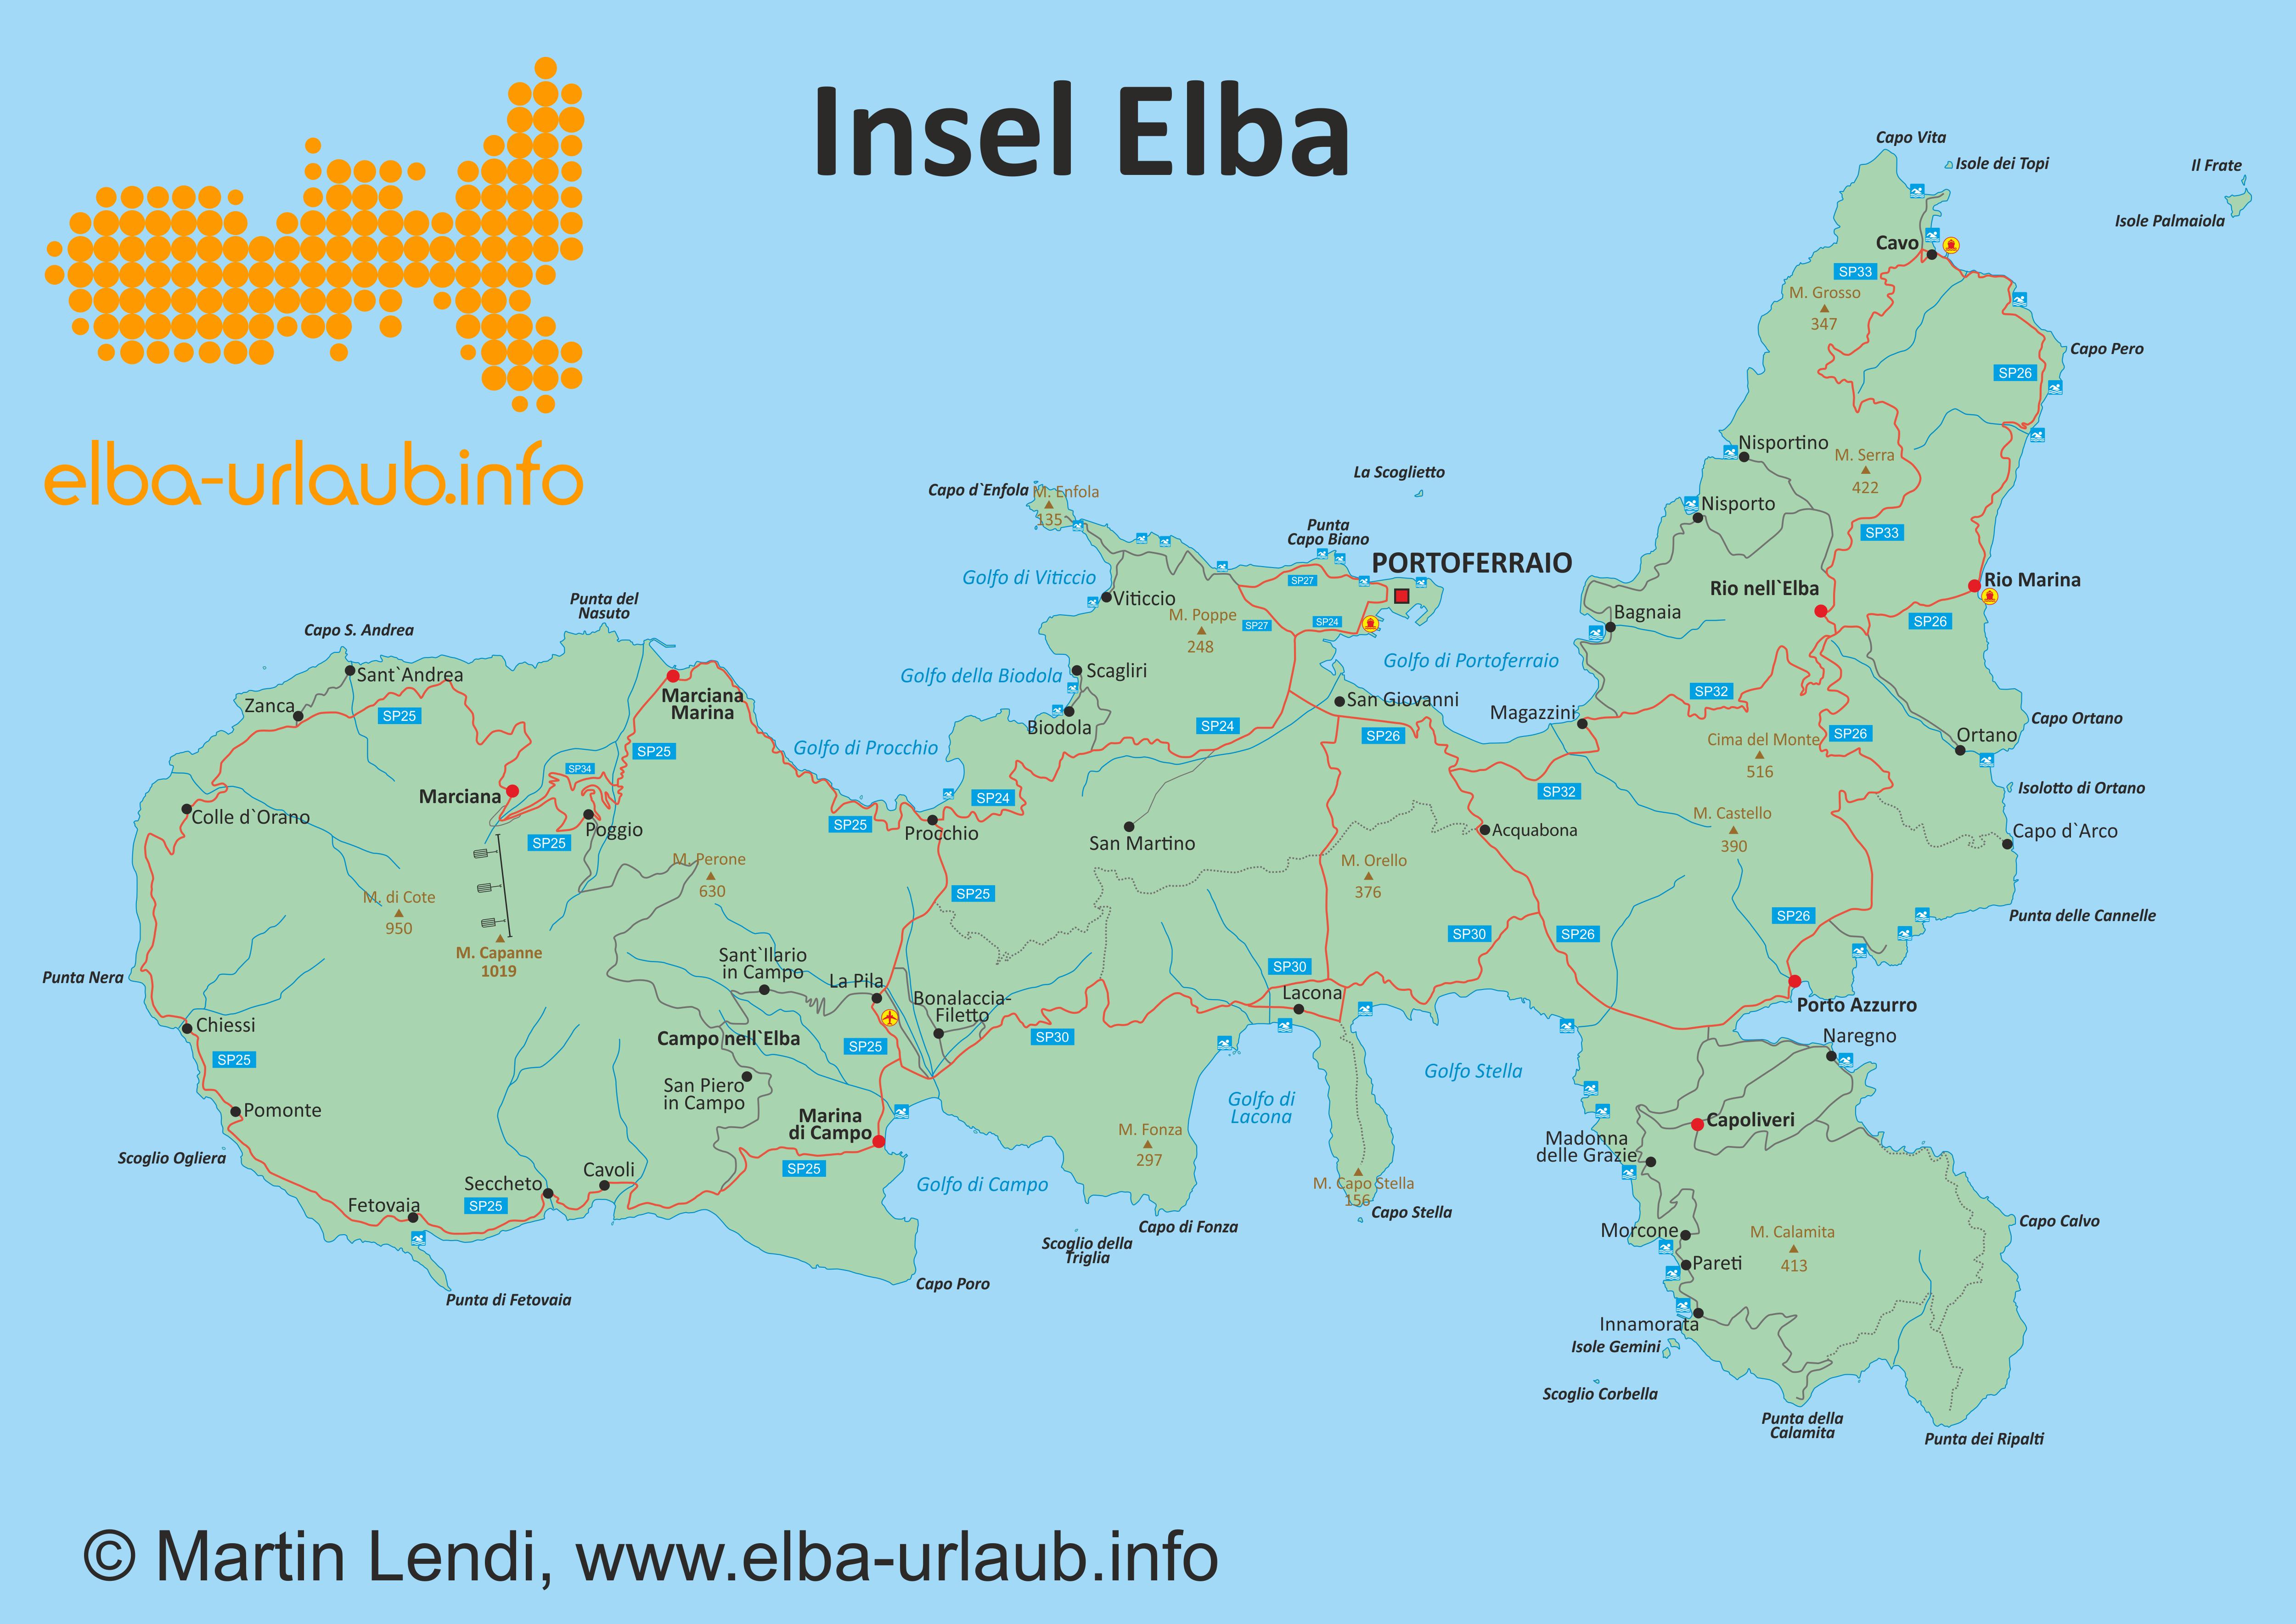 Elba Karte.Karte Der Insel Elba Insel Elba Der Grosse Reiseführer